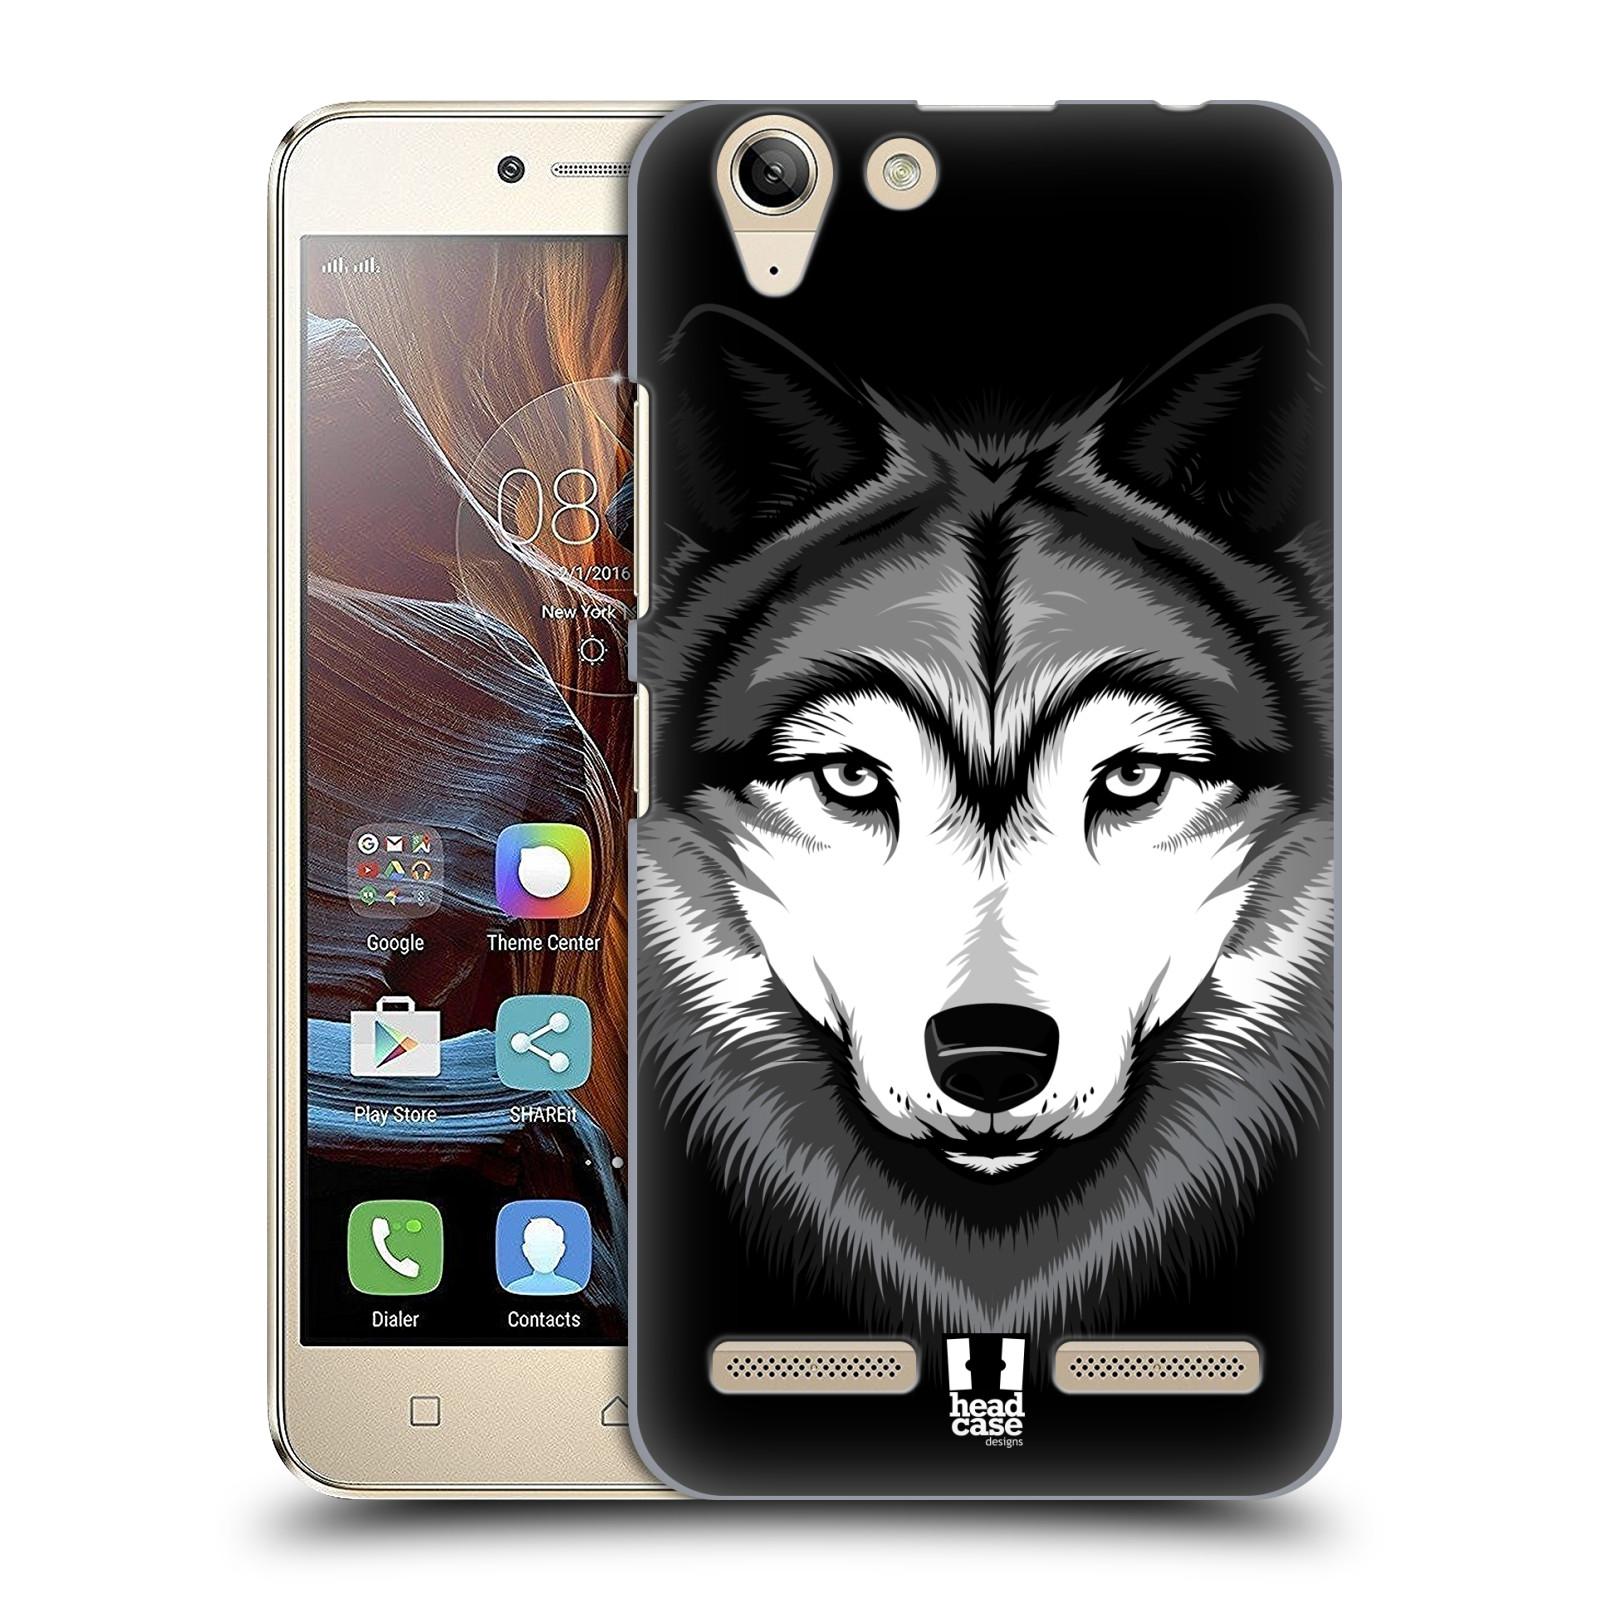 HEAD CASE plastový obal na mobil Lenovo Vibe K5 / Lenovo Vibe K5 PLUS vzor Zvíře kreslená tvář 2 vlk